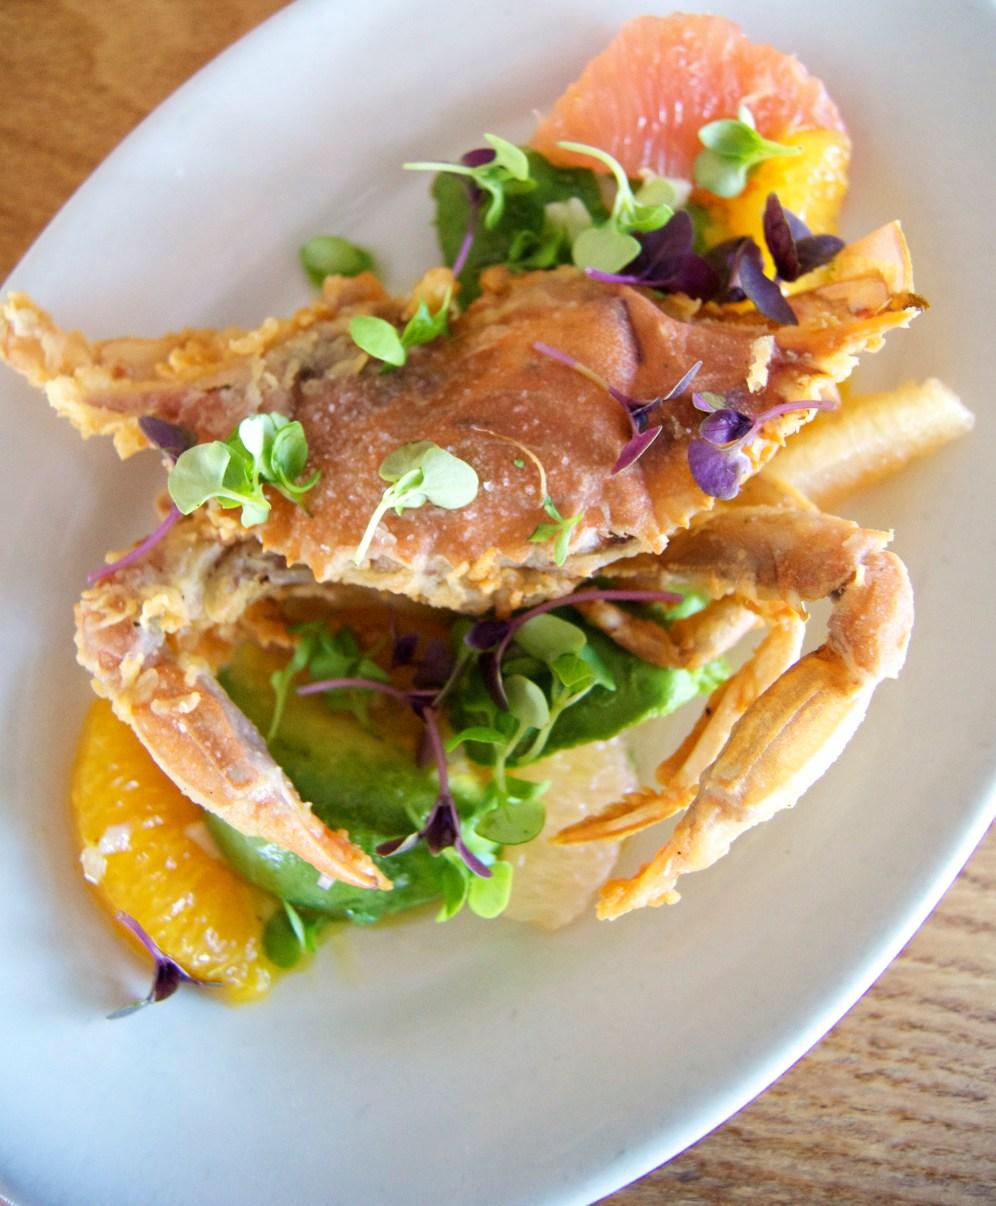 soft shell crab with citrus, avocado, and aioli